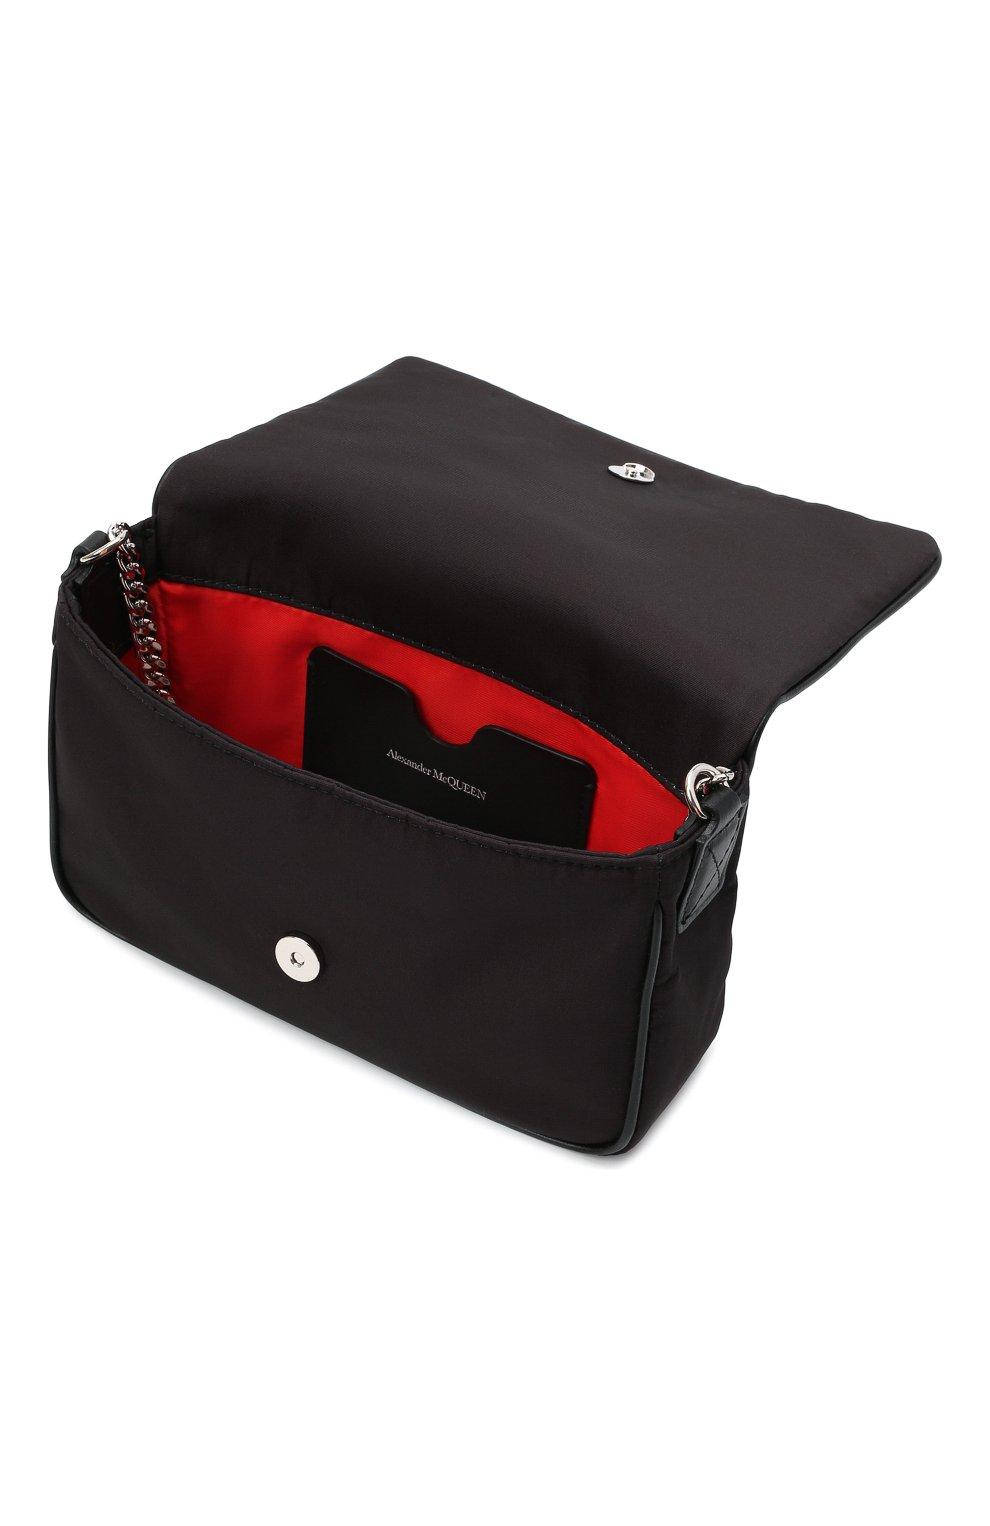 Женская сумка skull ALEXANDER MCQUEEN черного цвета, арт. 666120/16XAB | Фото 4 (Сумки-технические: Сумки через плечо; Размер: mini; Ремень/цепочка: На ремешке; Материал: Текстиль)